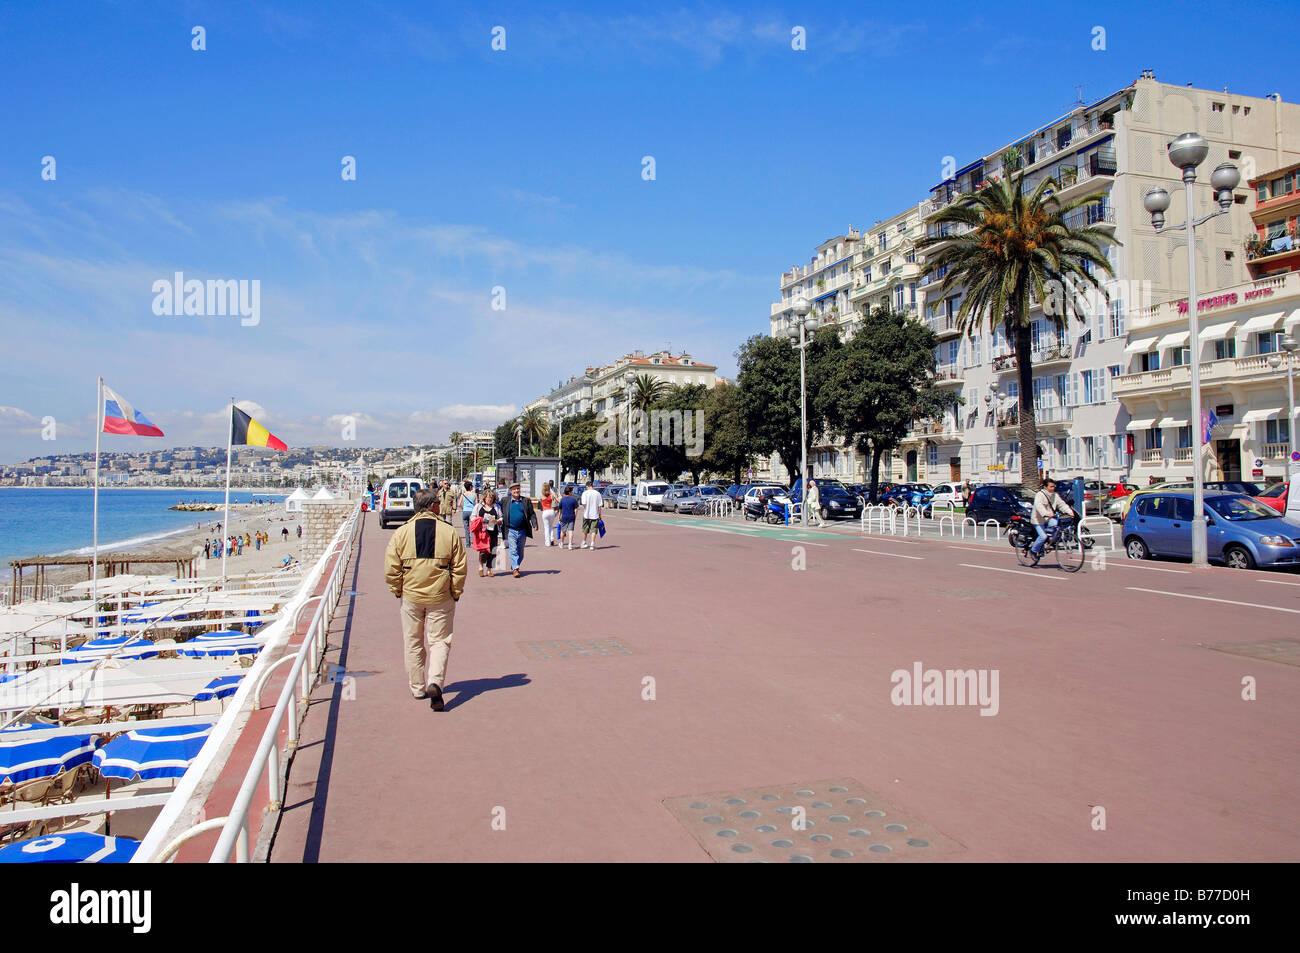 Lungomare Promenade des Anglais, Nice, Alpes-Maritimes, Provence-Alpes-Côte d'Azur, in Francia meridionale, Immagini Stock